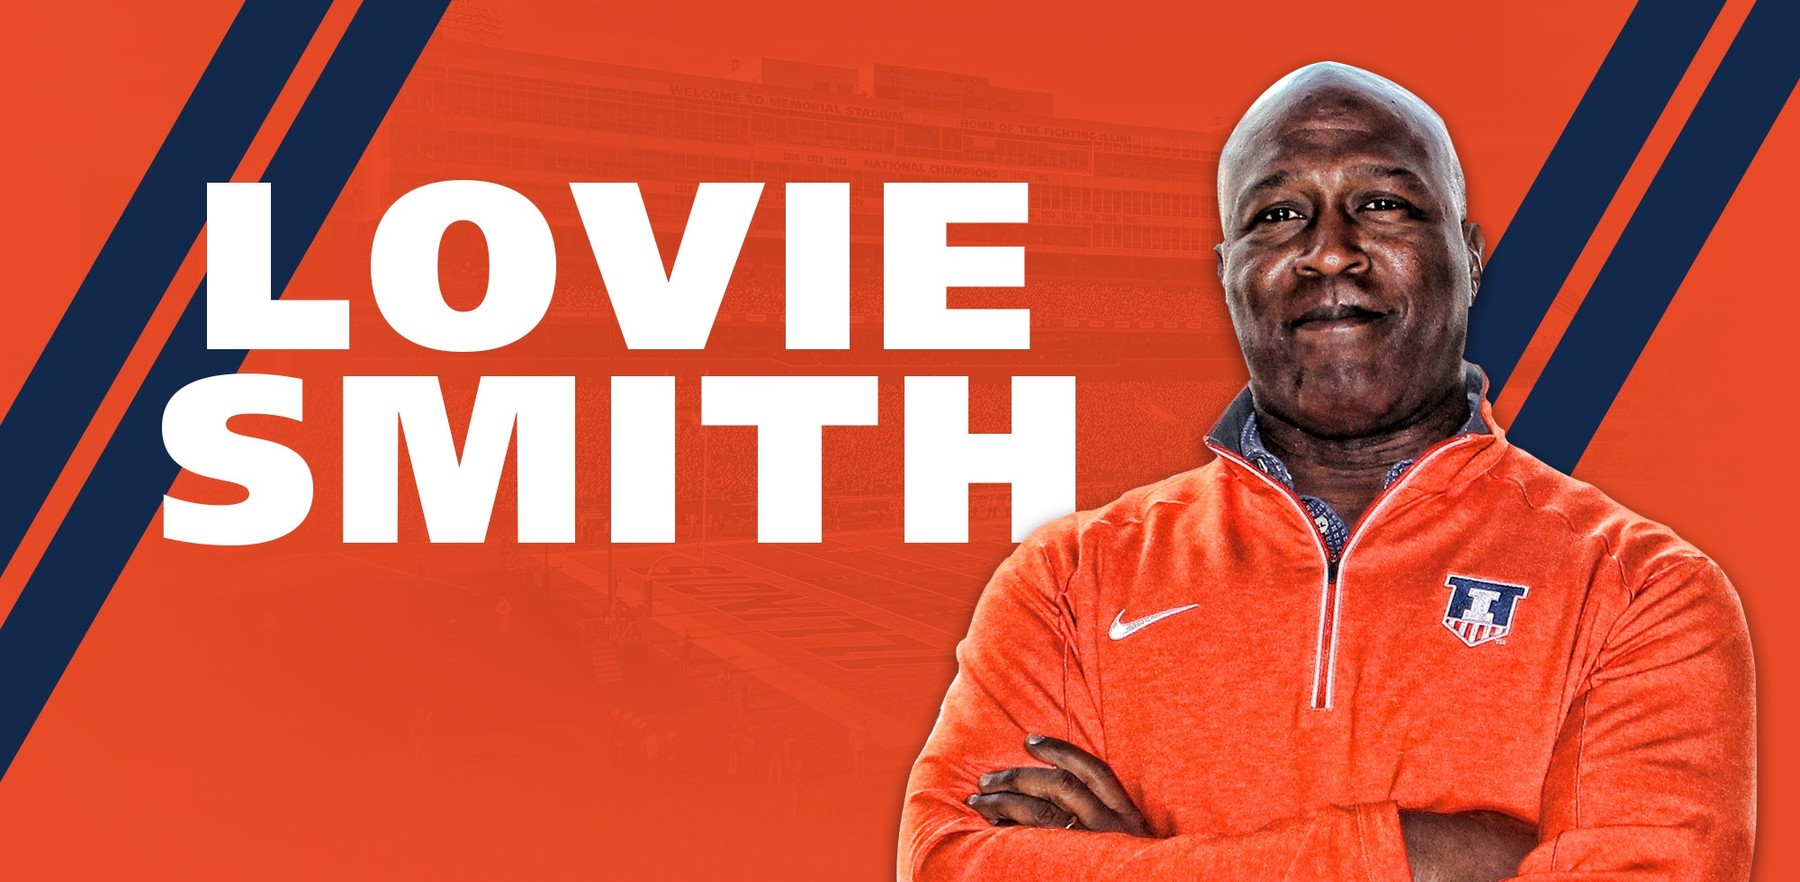 graphic image showing coach Lovie Smith